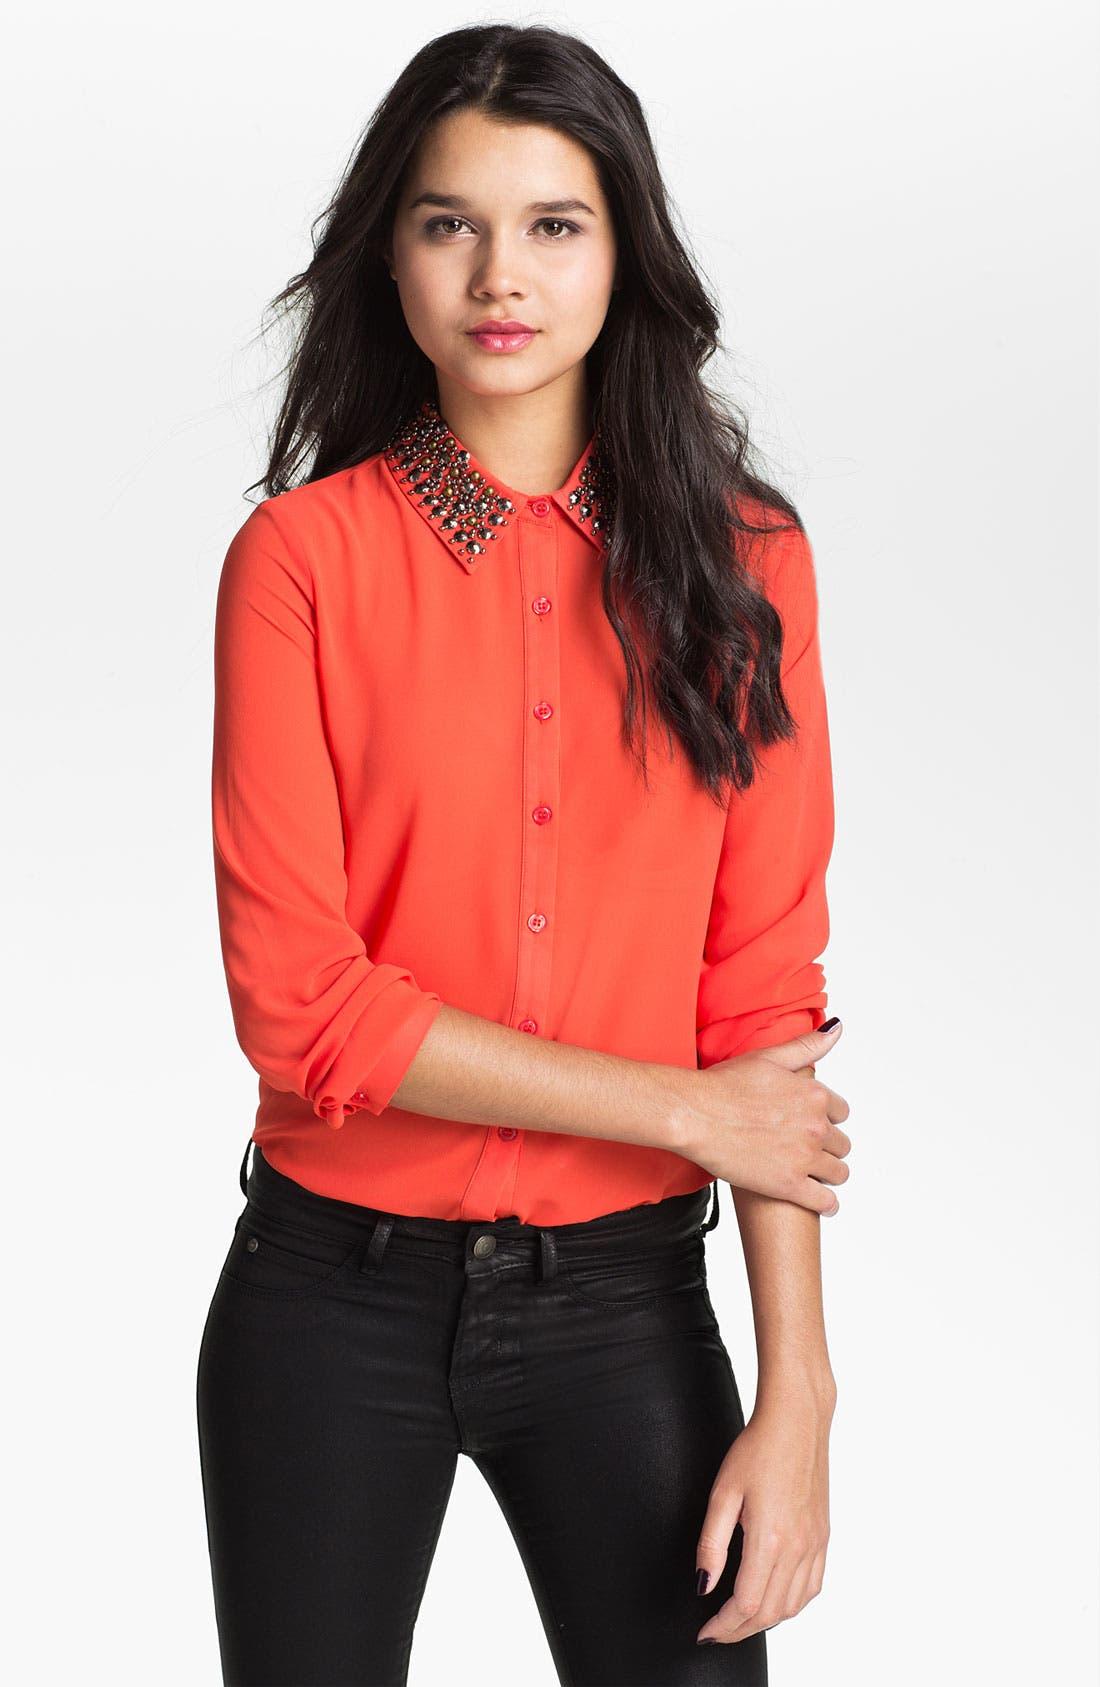 Alternate Image 1 Selected - Lush Embellished Collar Shirt (Juniors)